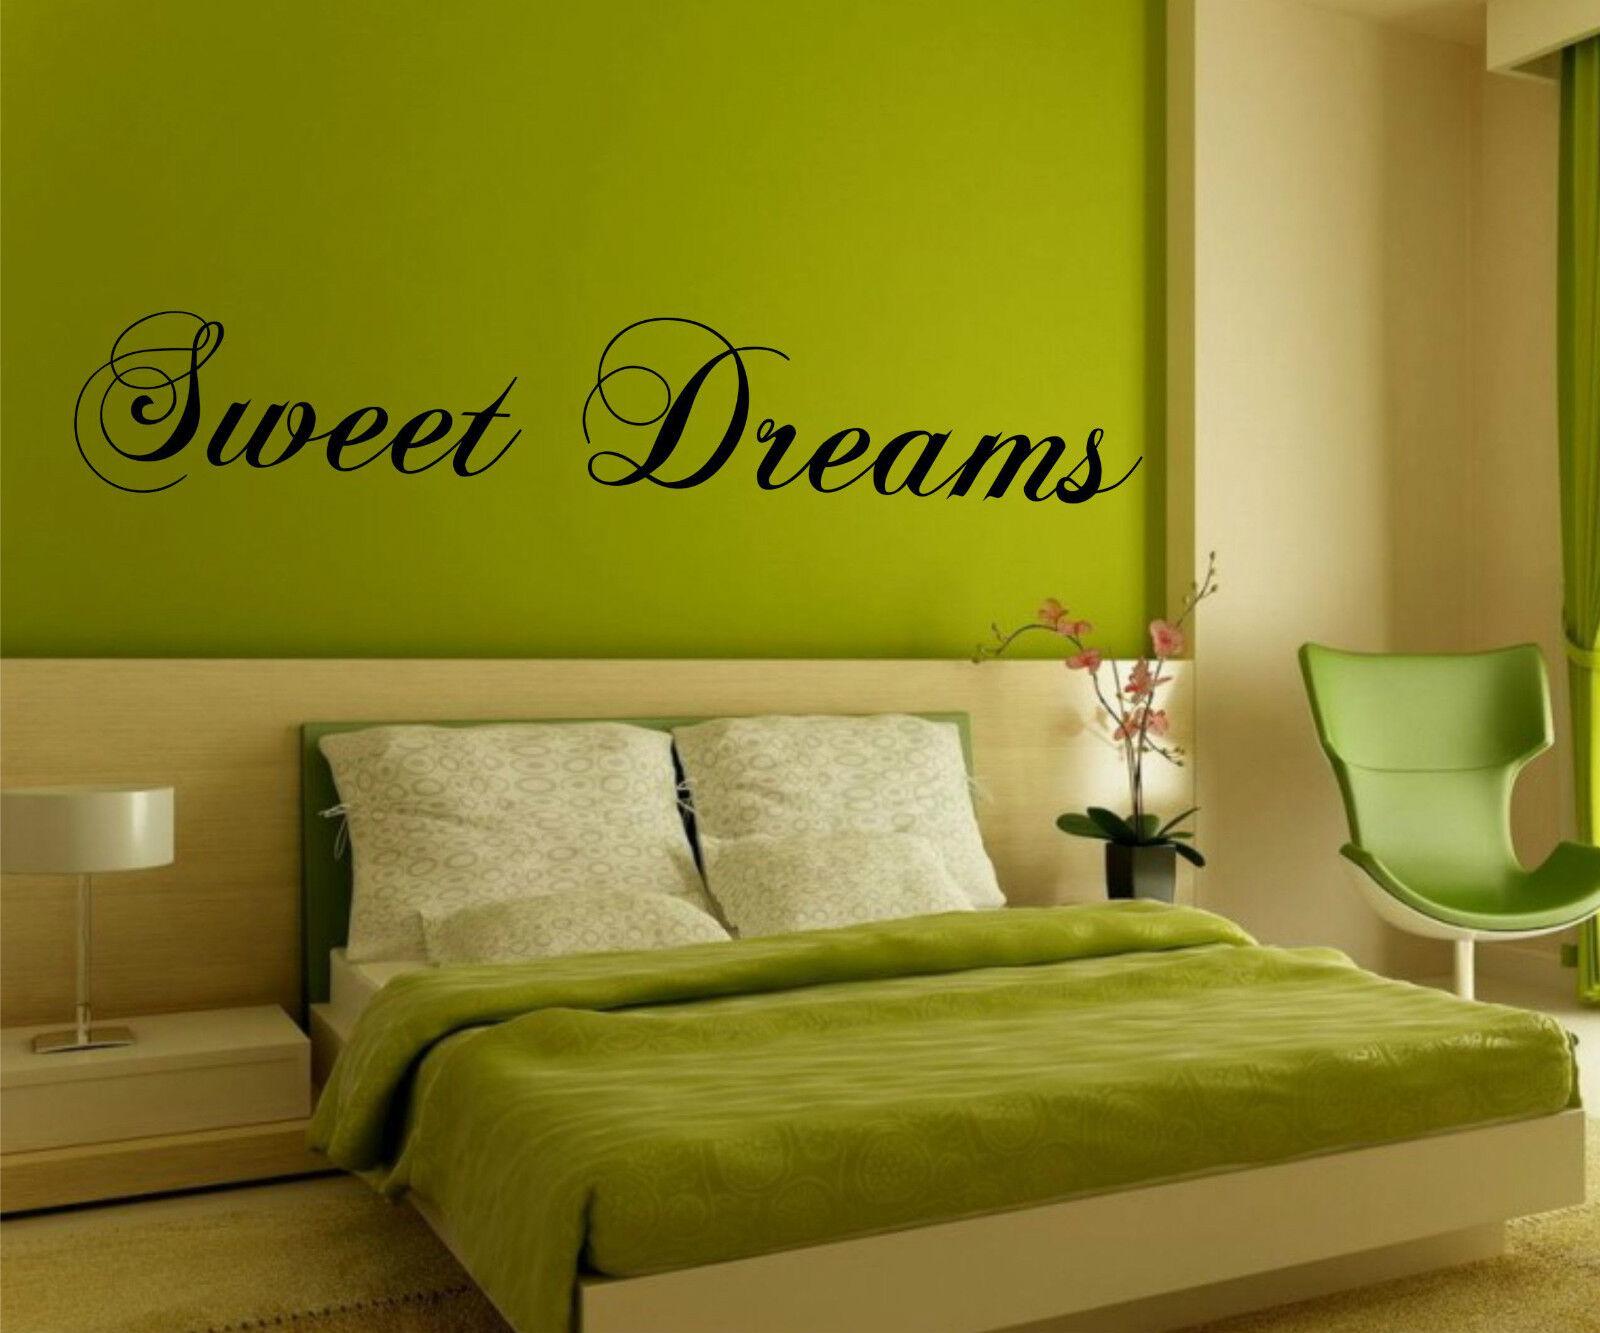 Home Decor , Childrens Home & Furniture , Home, Furniture & DIY